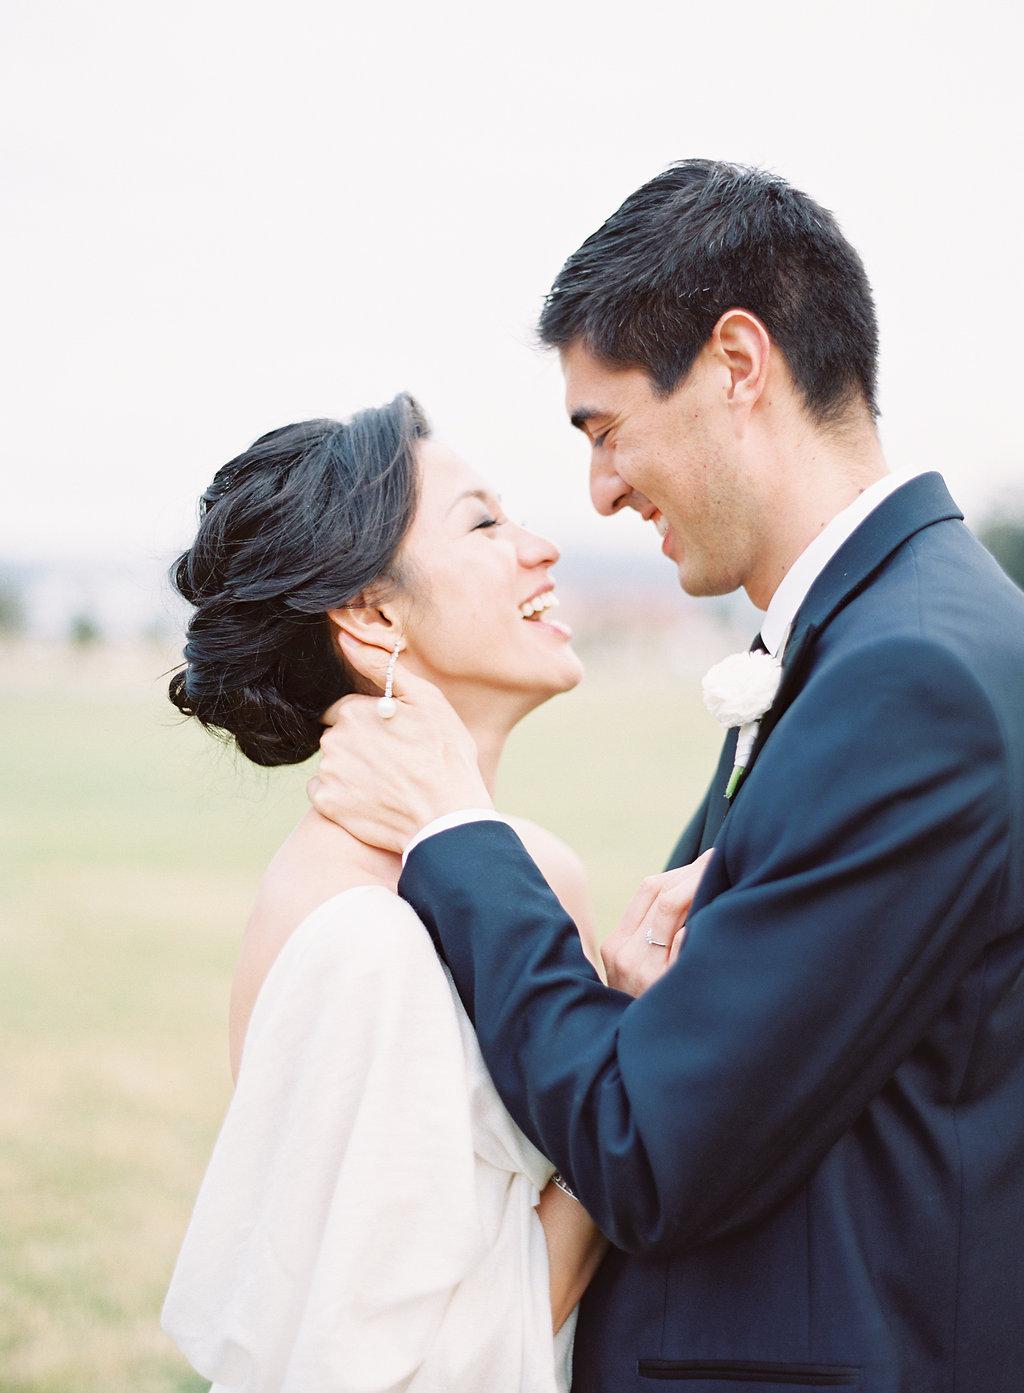 Cavallo-Point-Wedding-San-Francisco- Film-Photographer-600.jpg